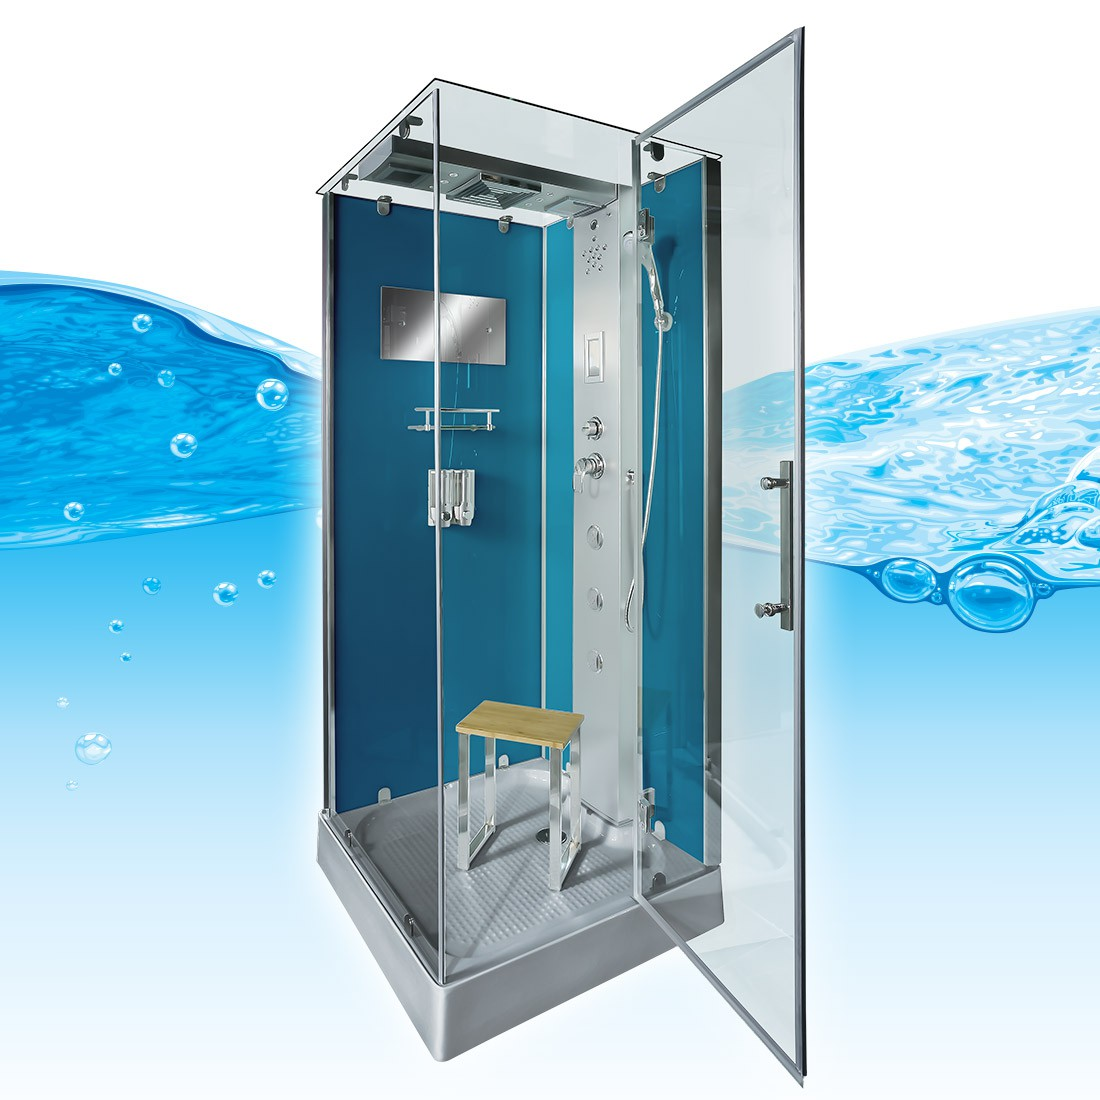 acquavapore dtp6038 3101r dusche duschtempel komplett duschkabine th 90x90 ebay. Black Bedroom Furniture Sets. Home Design Ideas